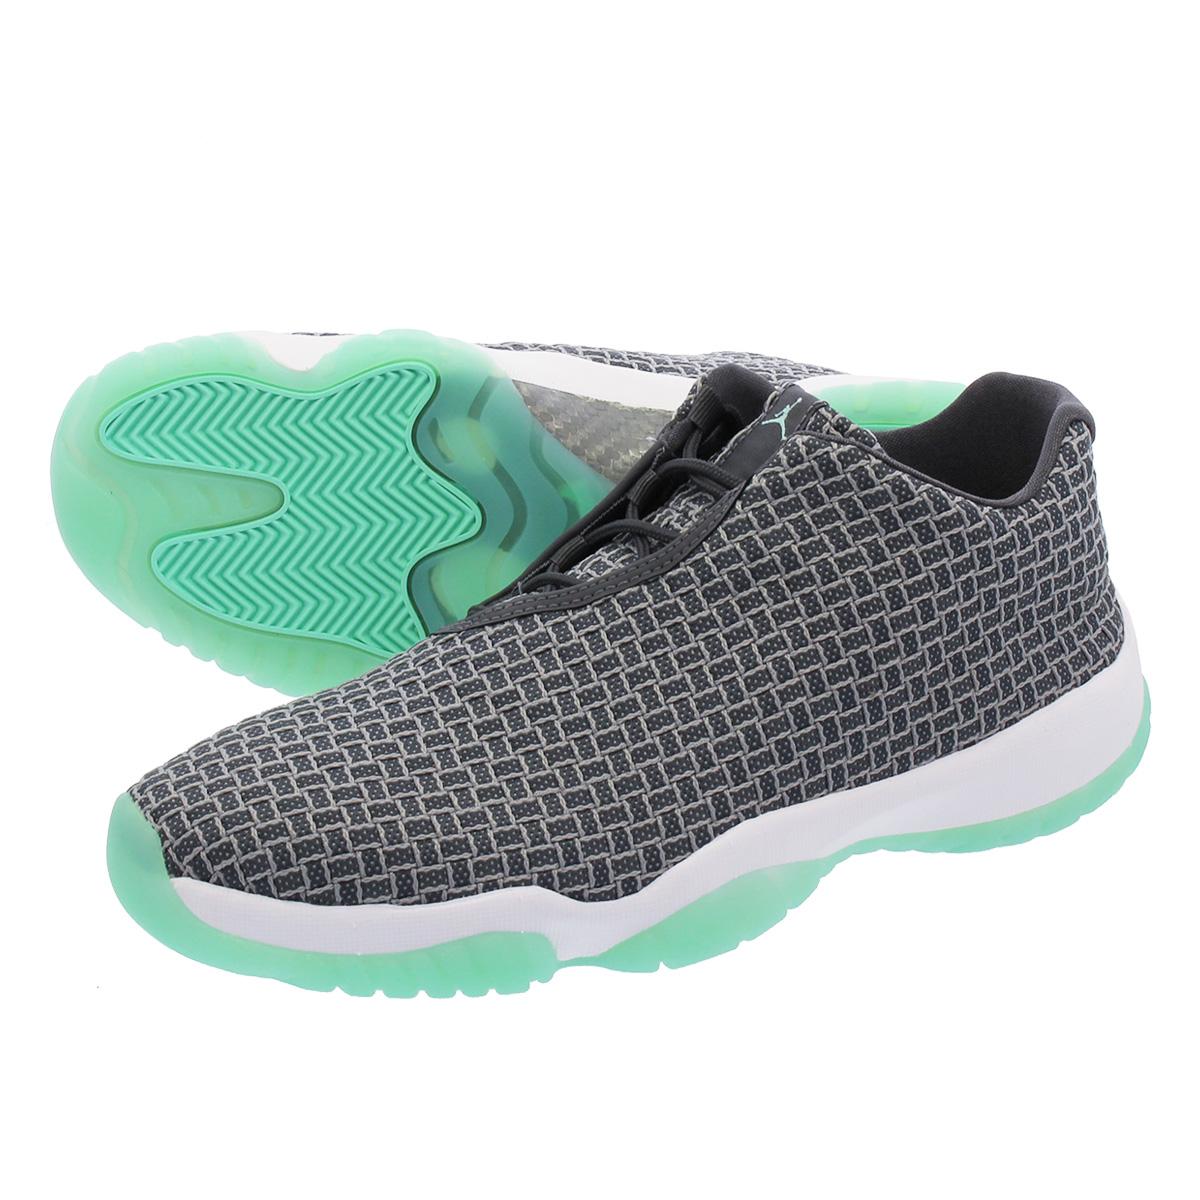 check-out ad4b4 8f76d NIKE AIR JORDAN FUTURE LOW Nike Air Jordan future low WOLF GREY/EMERALD  RISE/WHITE 718,948-006